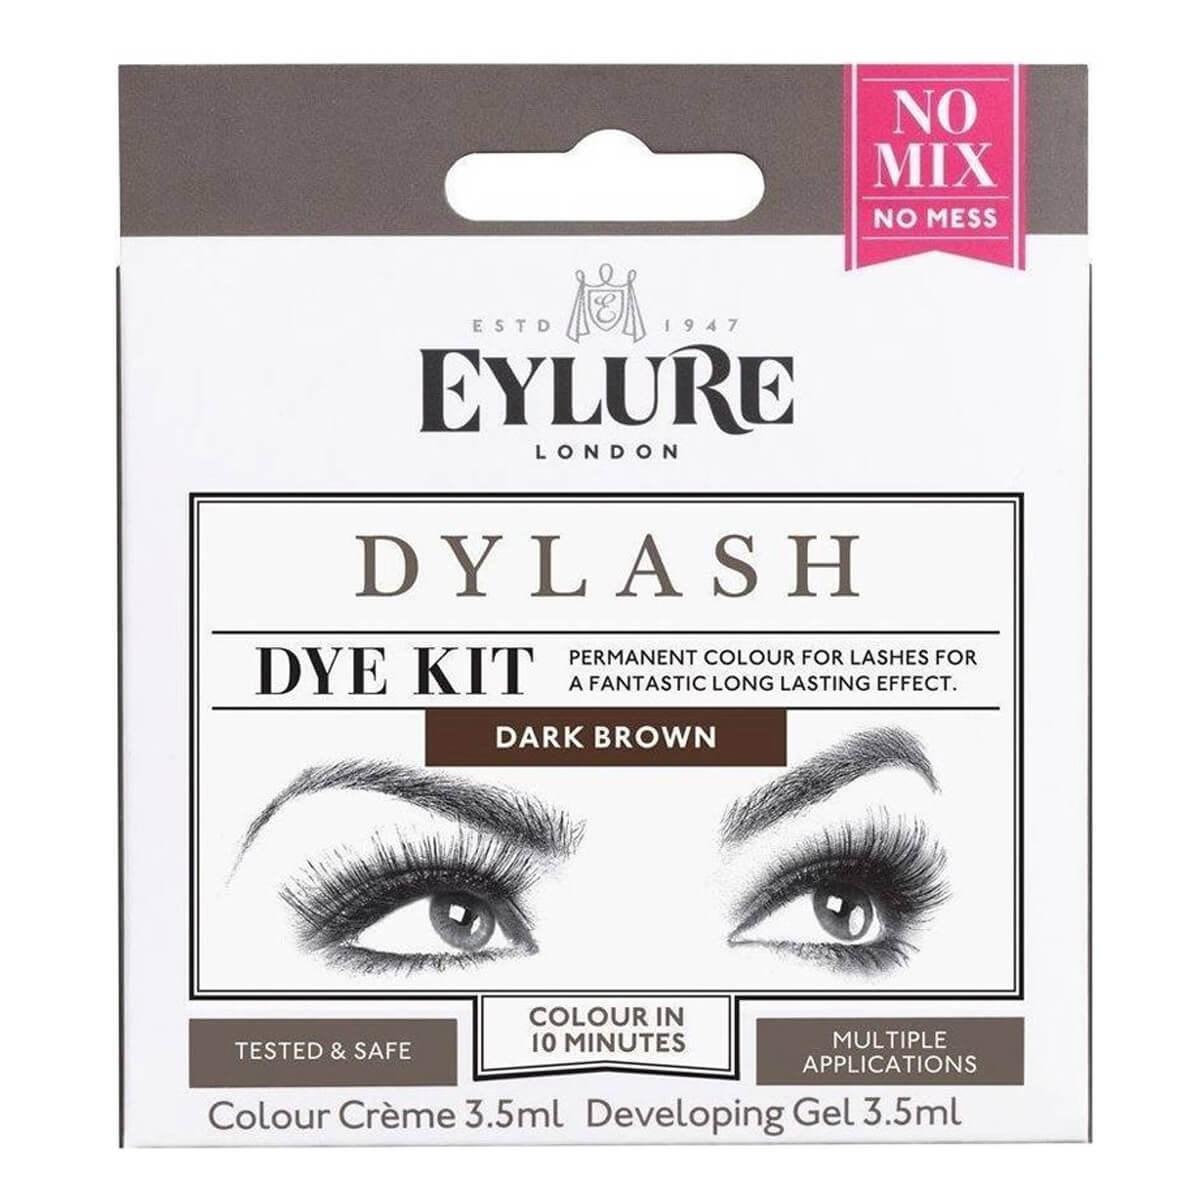 Eylure Pro-Lash Dylash Kit